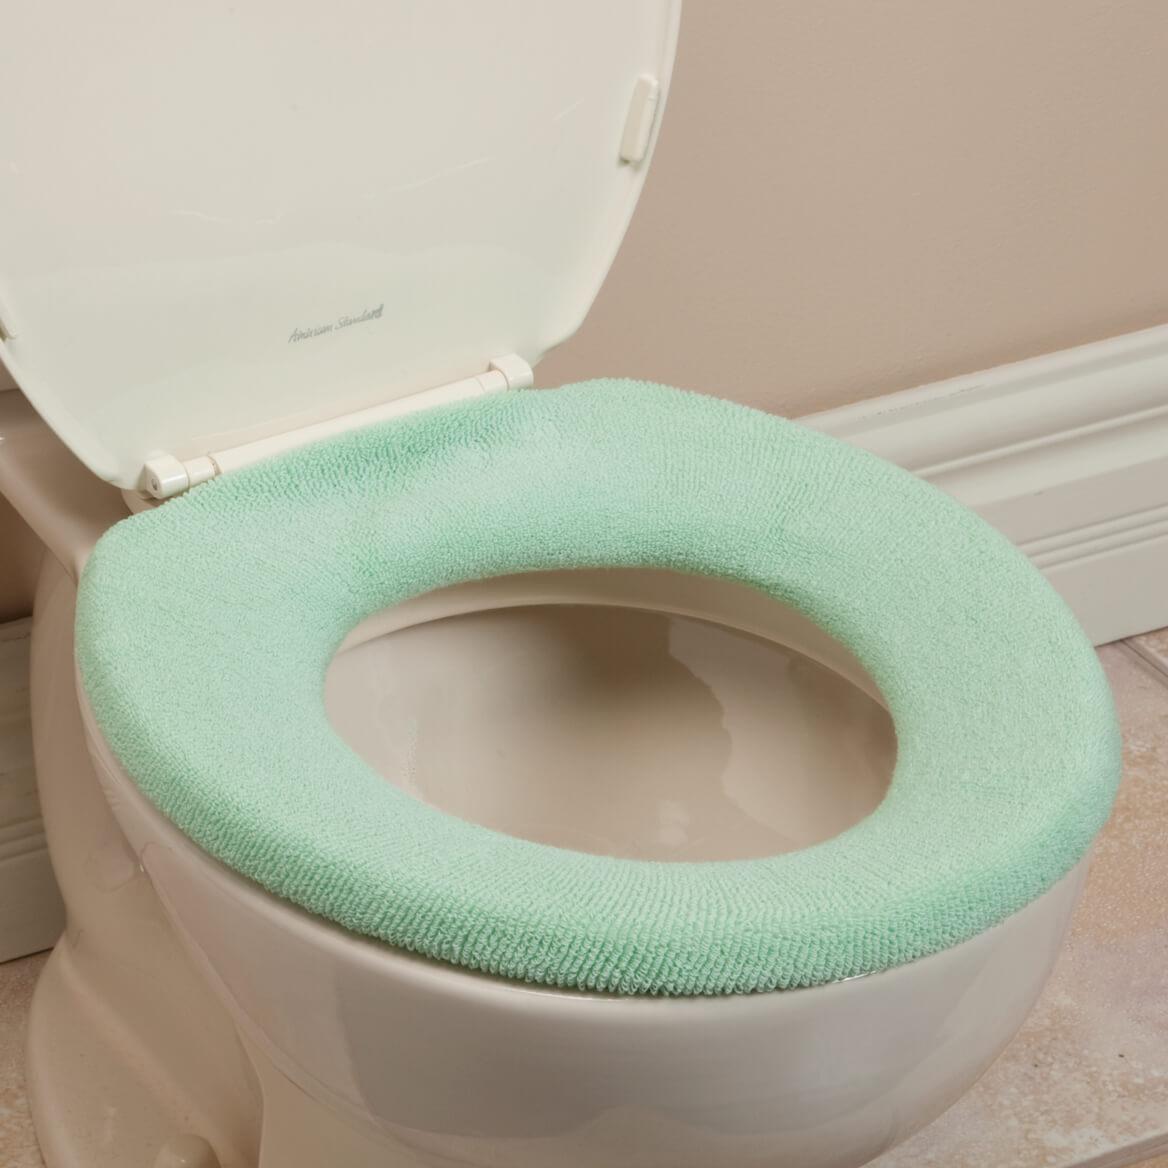 Stupendous Toilet Seat Cover Creativecarmelina Interior Chair Design Creativecarmelinacom